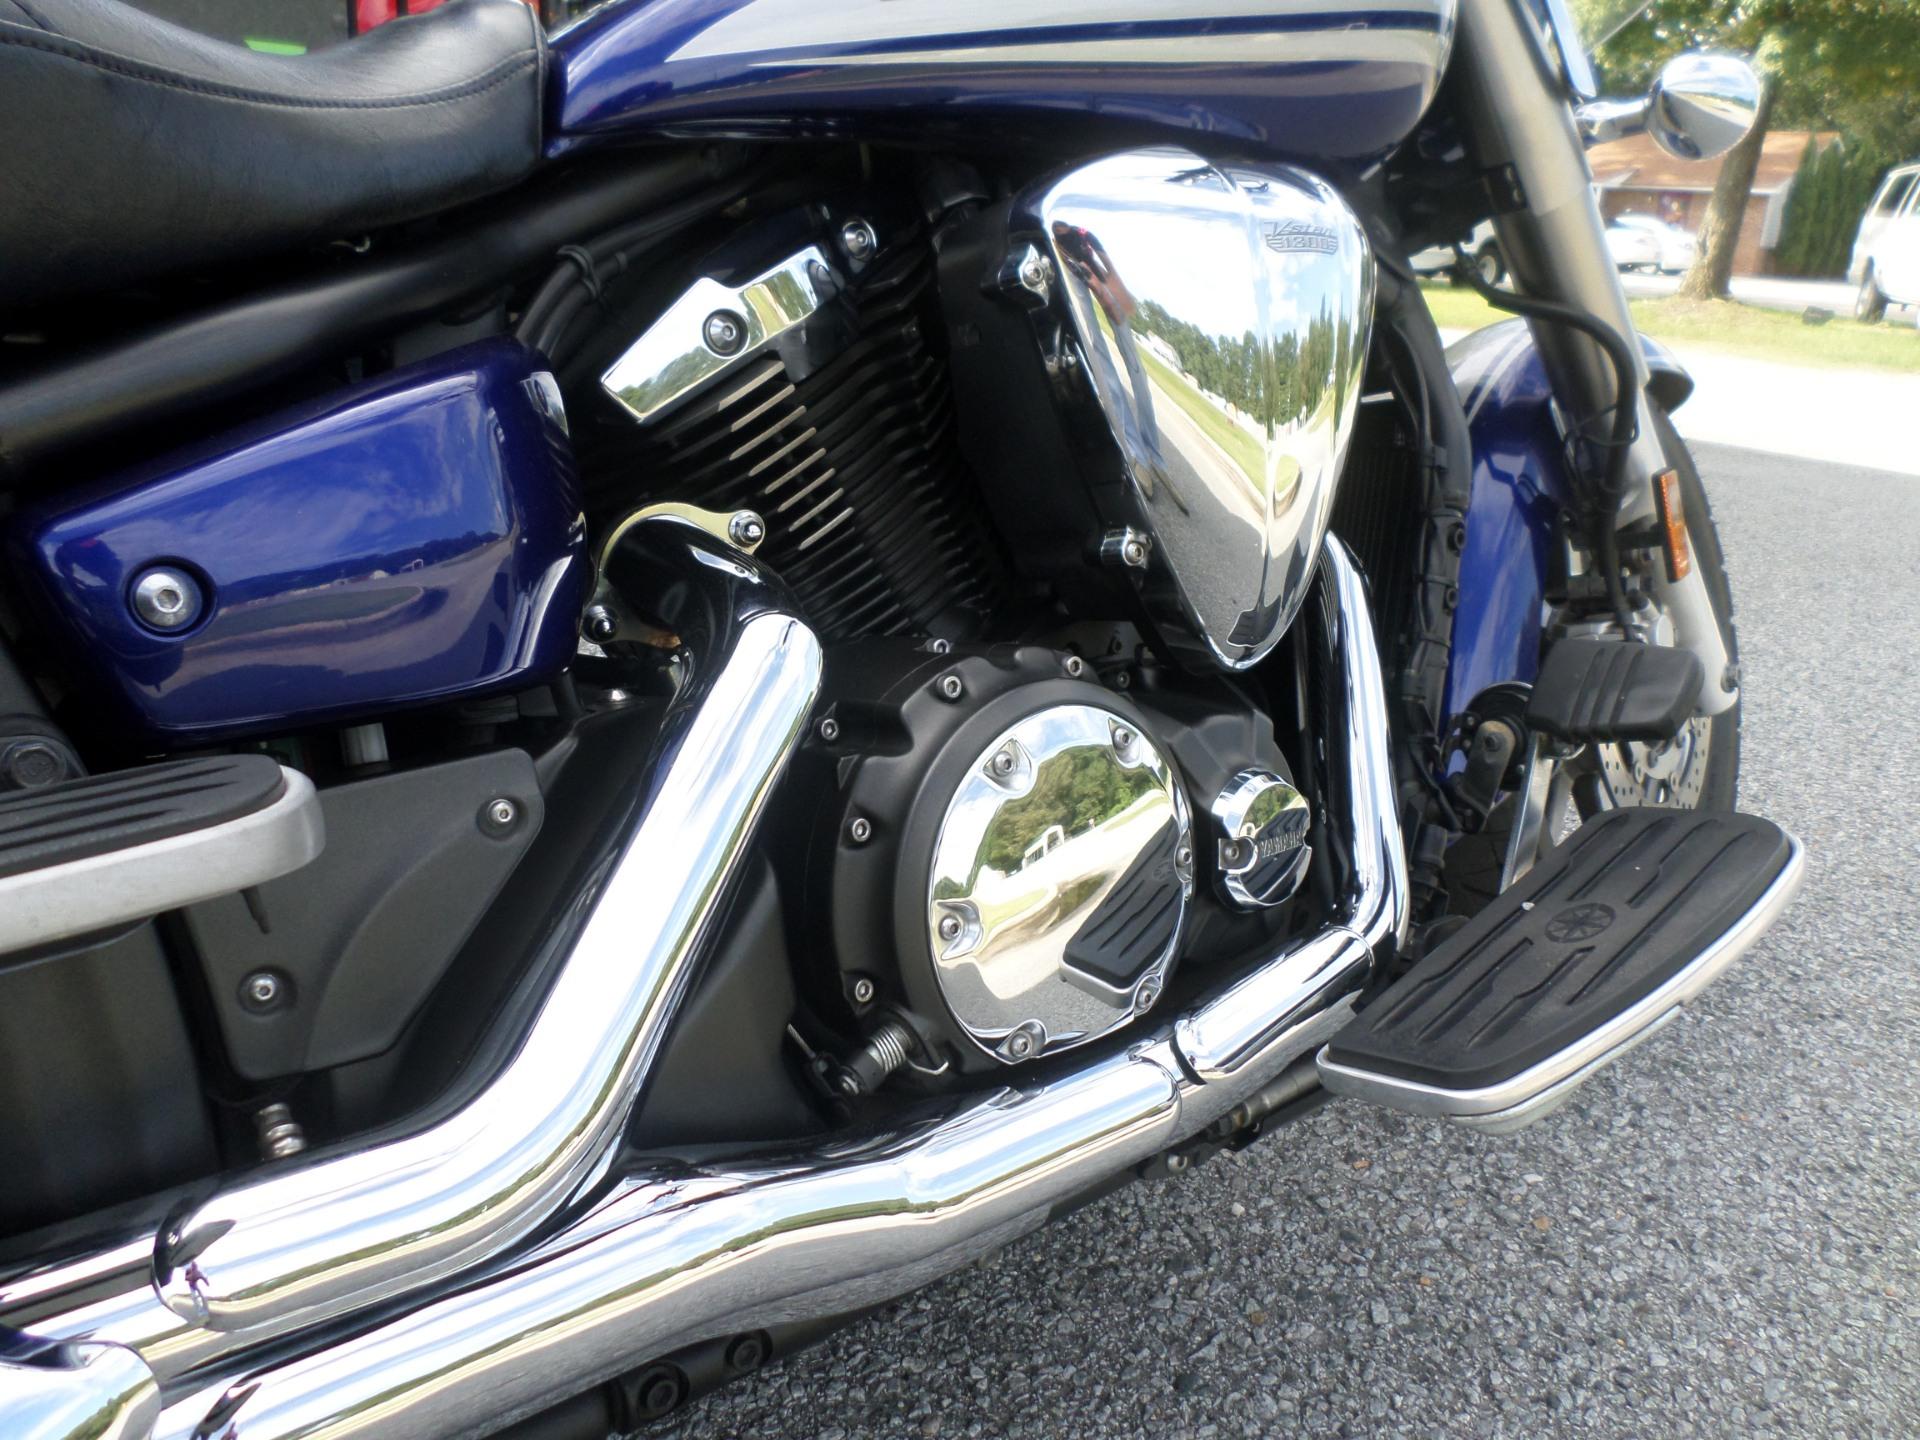 2009 Yamaha V Star 1300 Tourer in Greenville, North Carolina